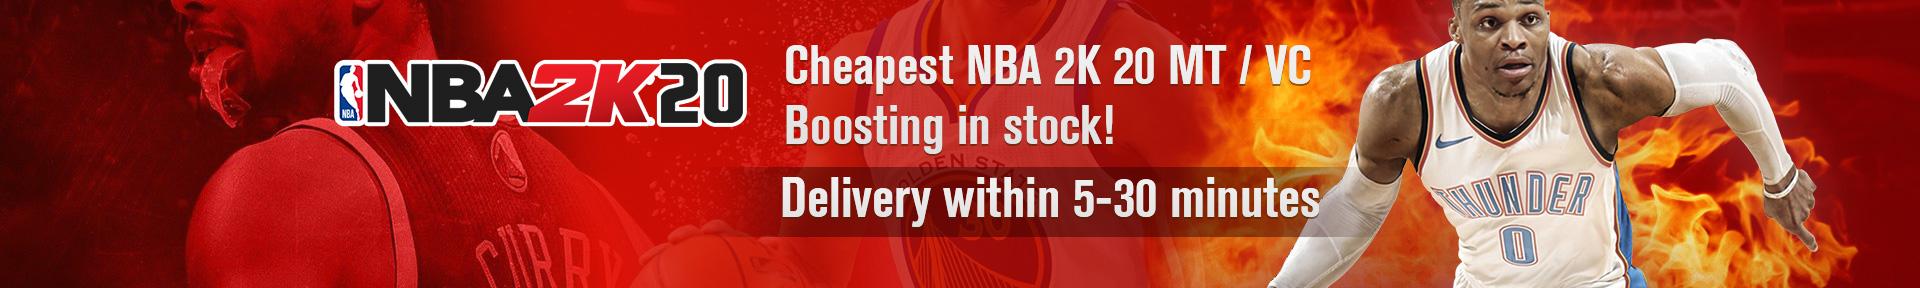 NBA 2K20 VC Boosting